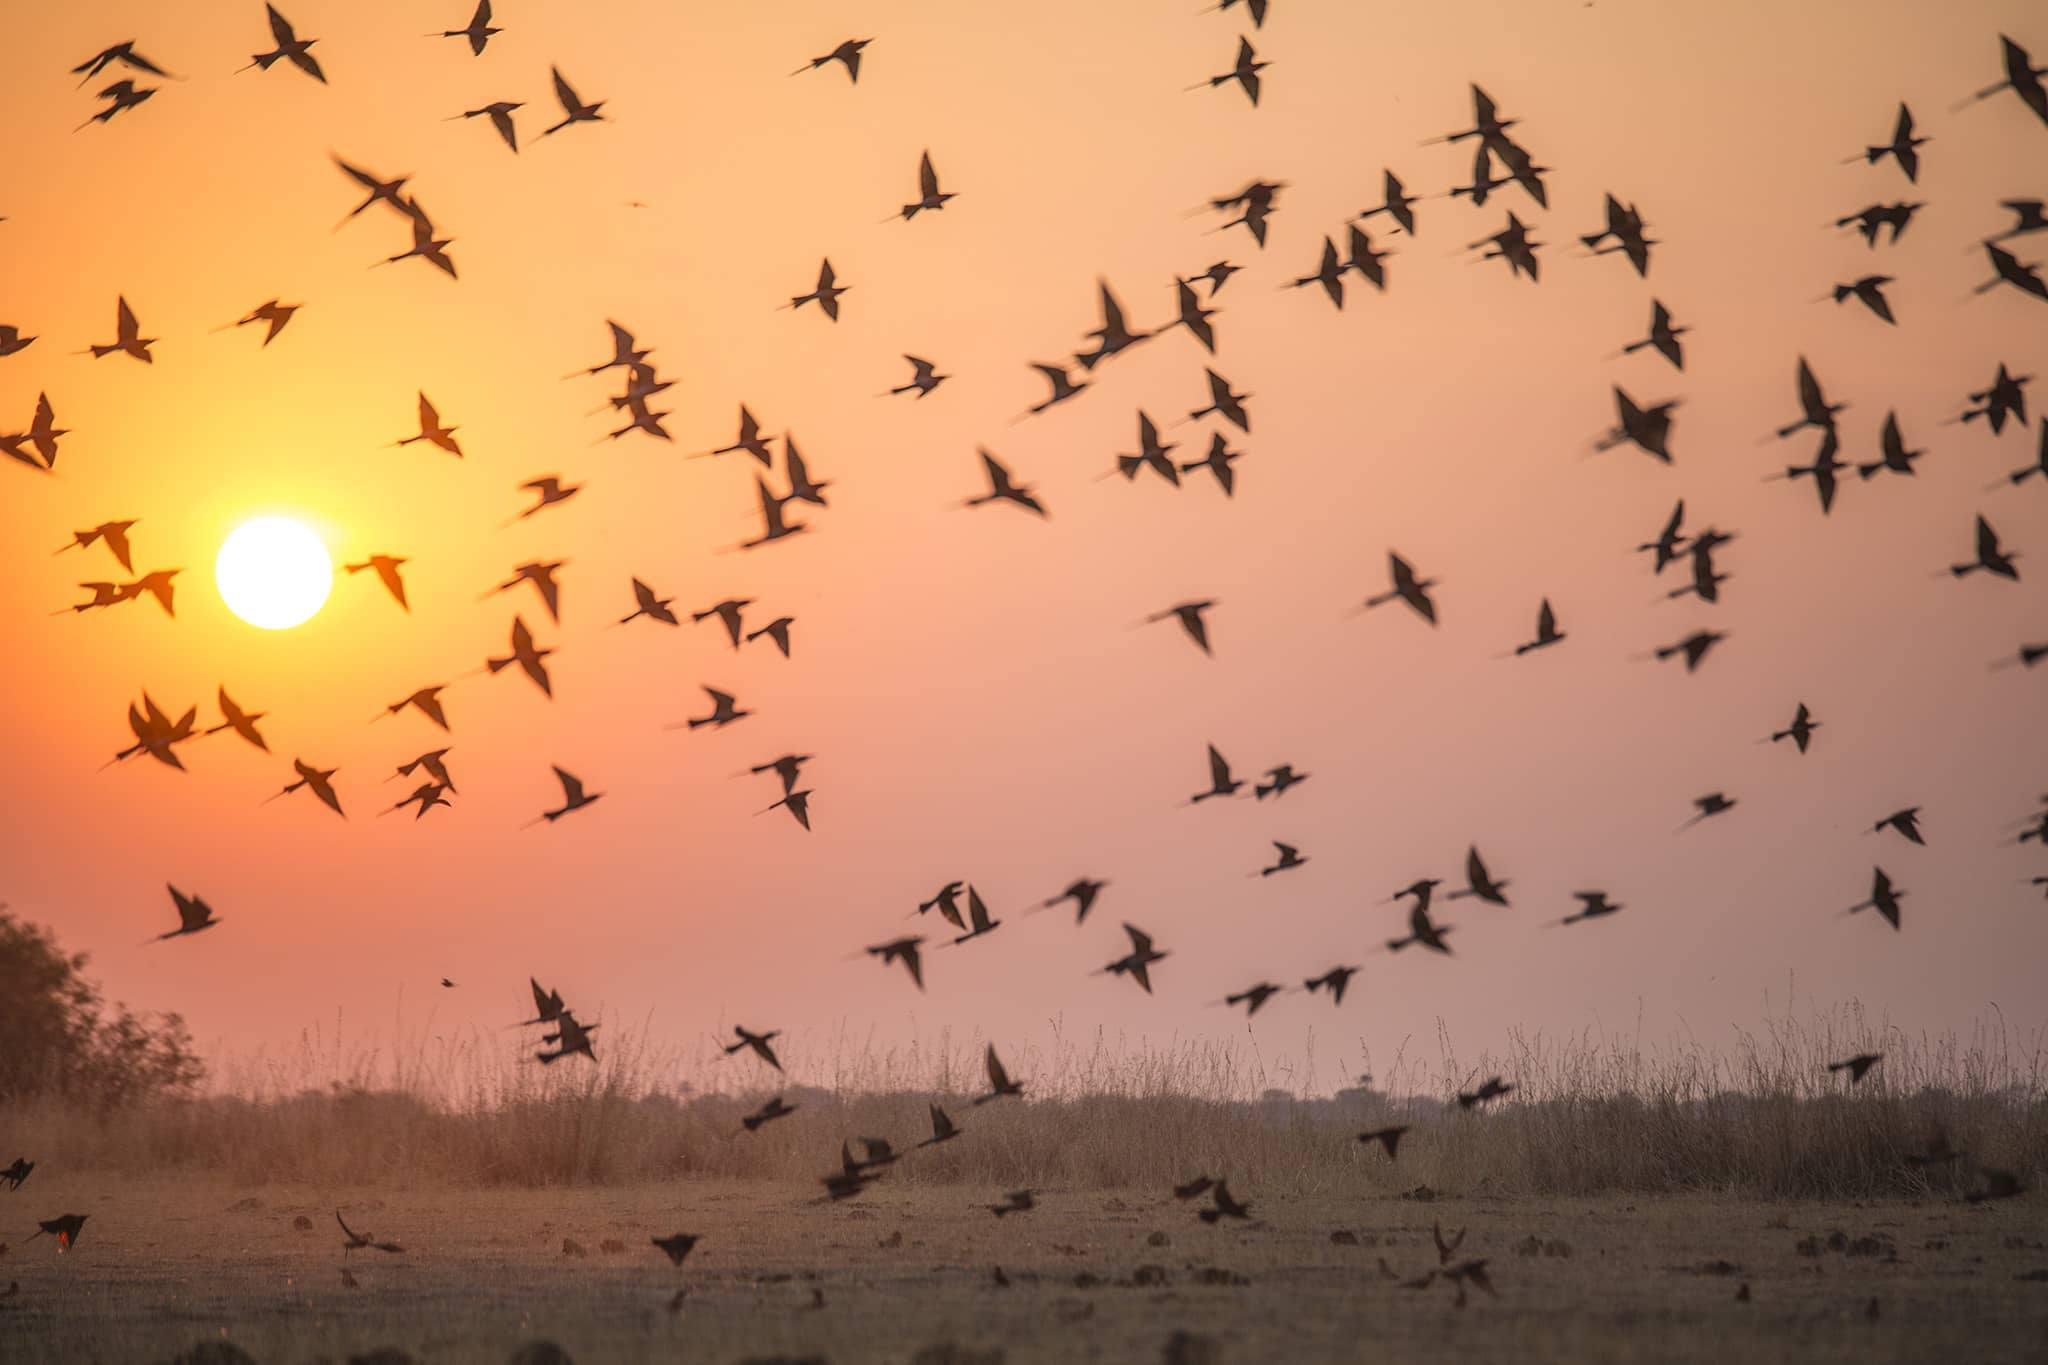 Flock of birds at sunset - Kings Pool Botswana